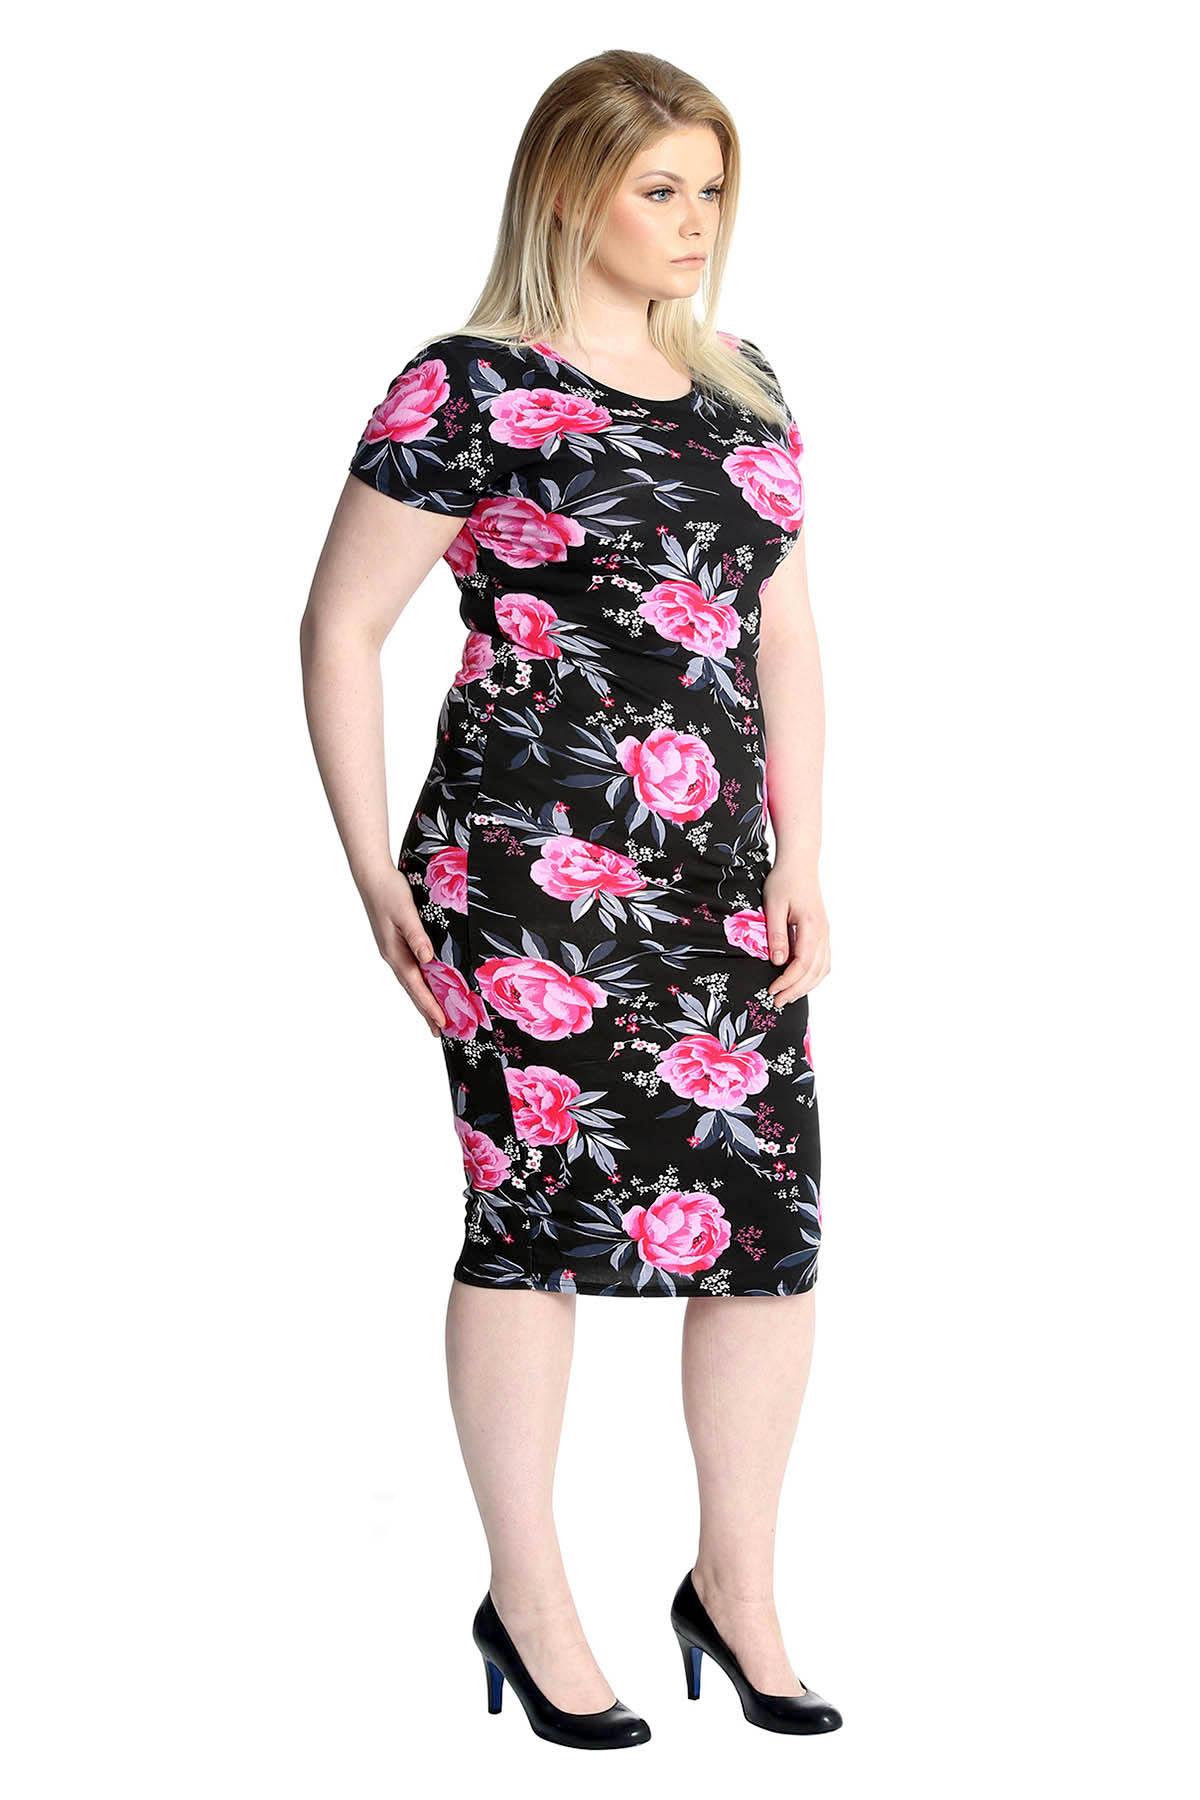 New Womens Plus Size Dress Ladies Bodycon Midi Floral Print Tunic Soft Nouvelle